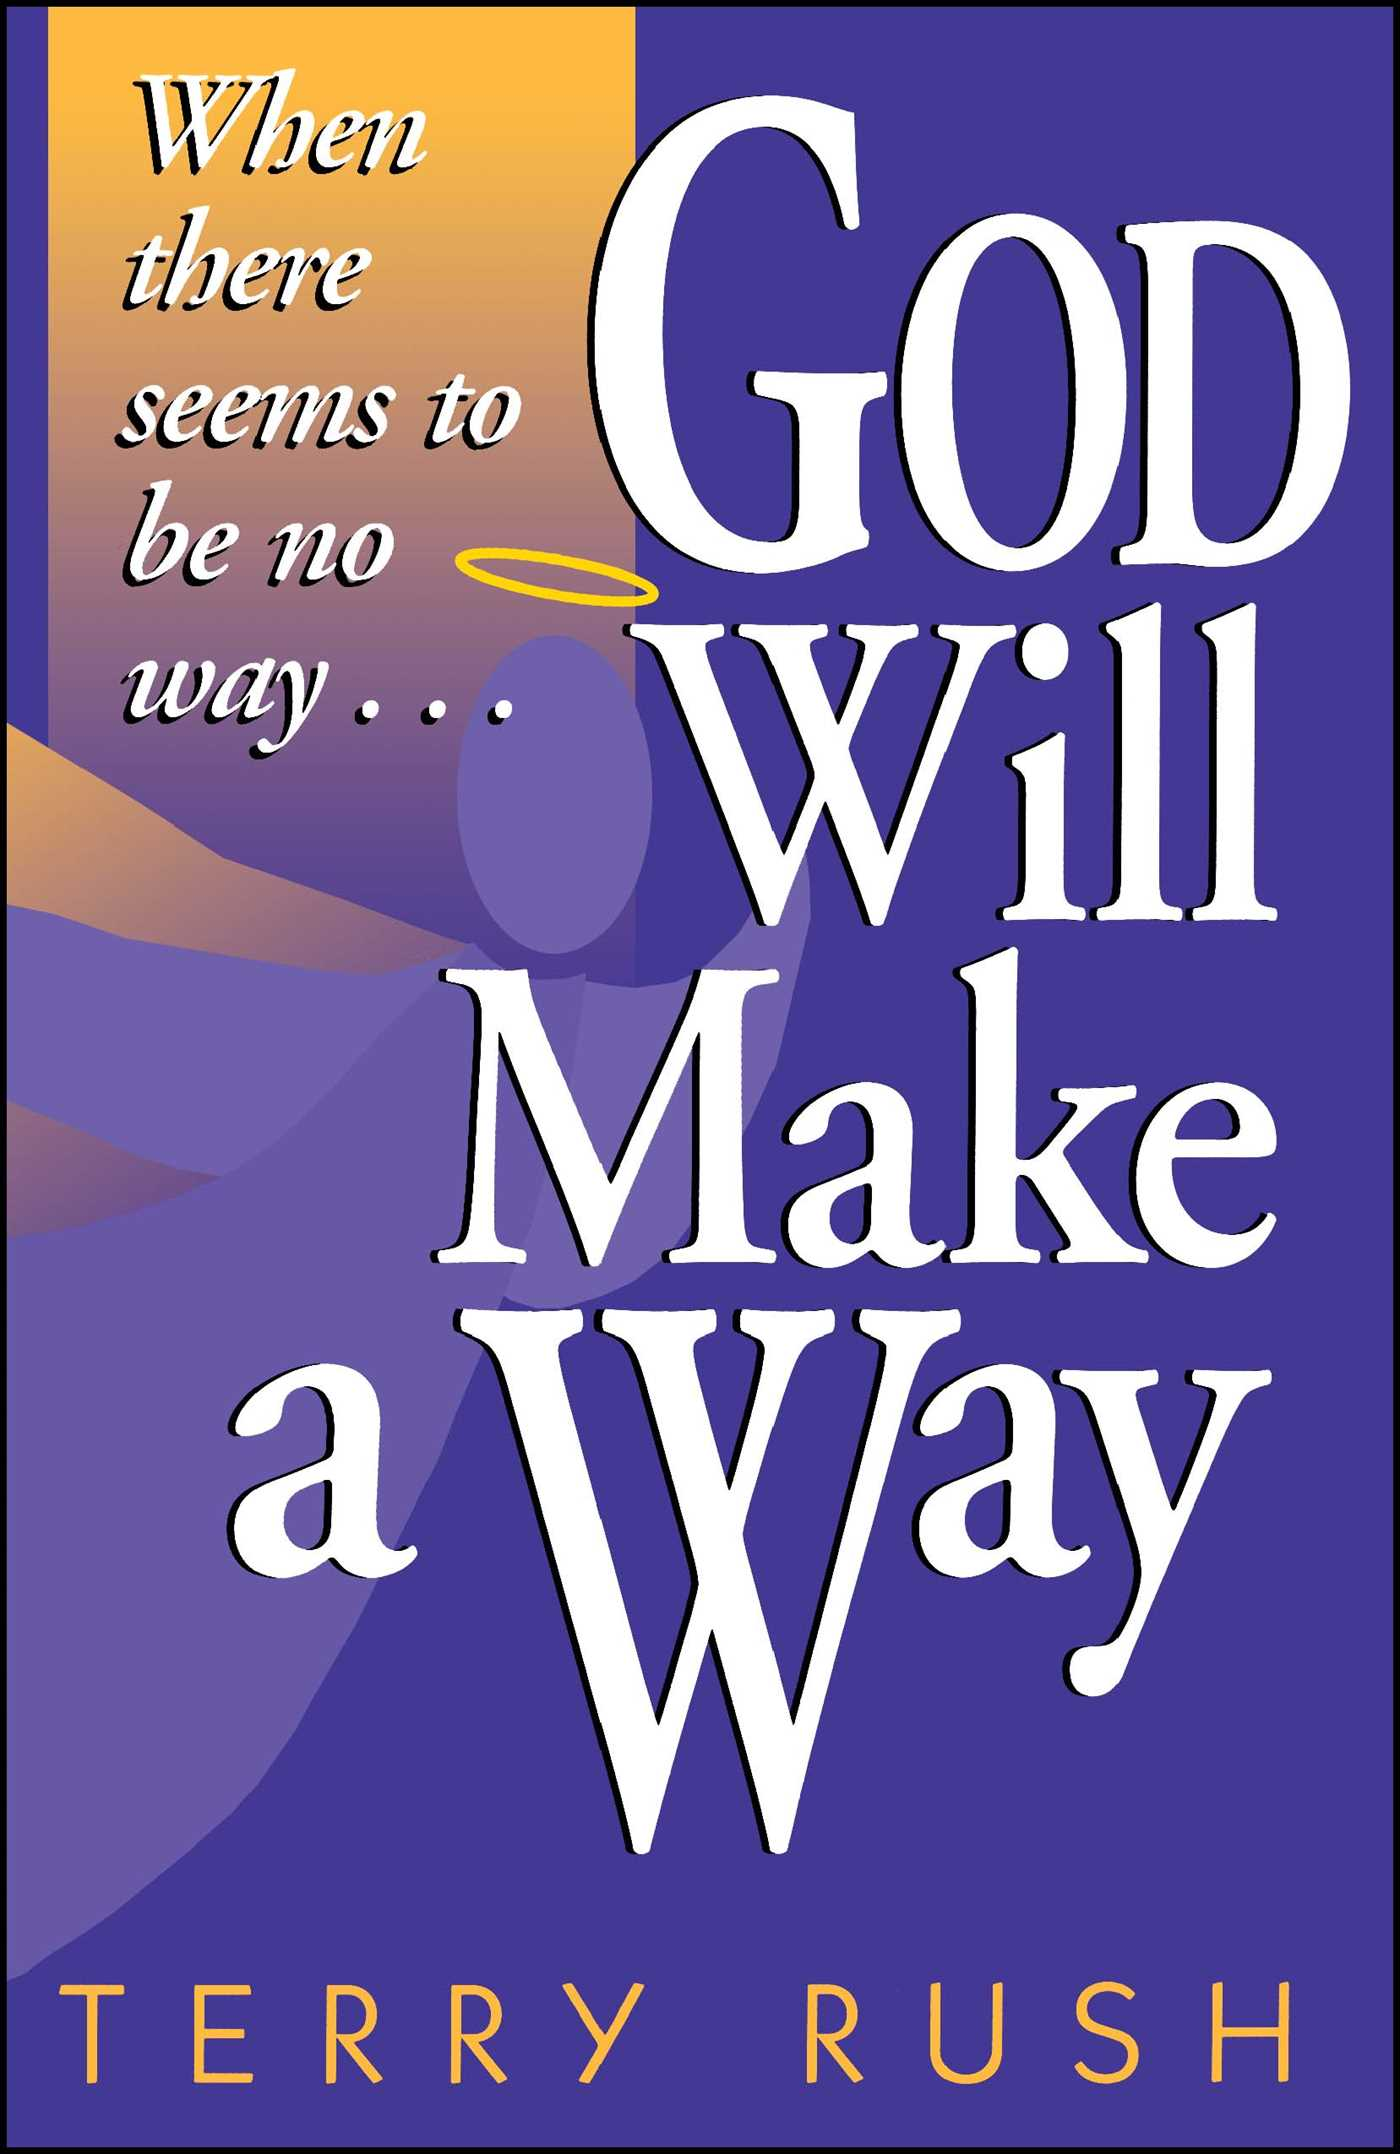 God will make a way 9781582293028 hr